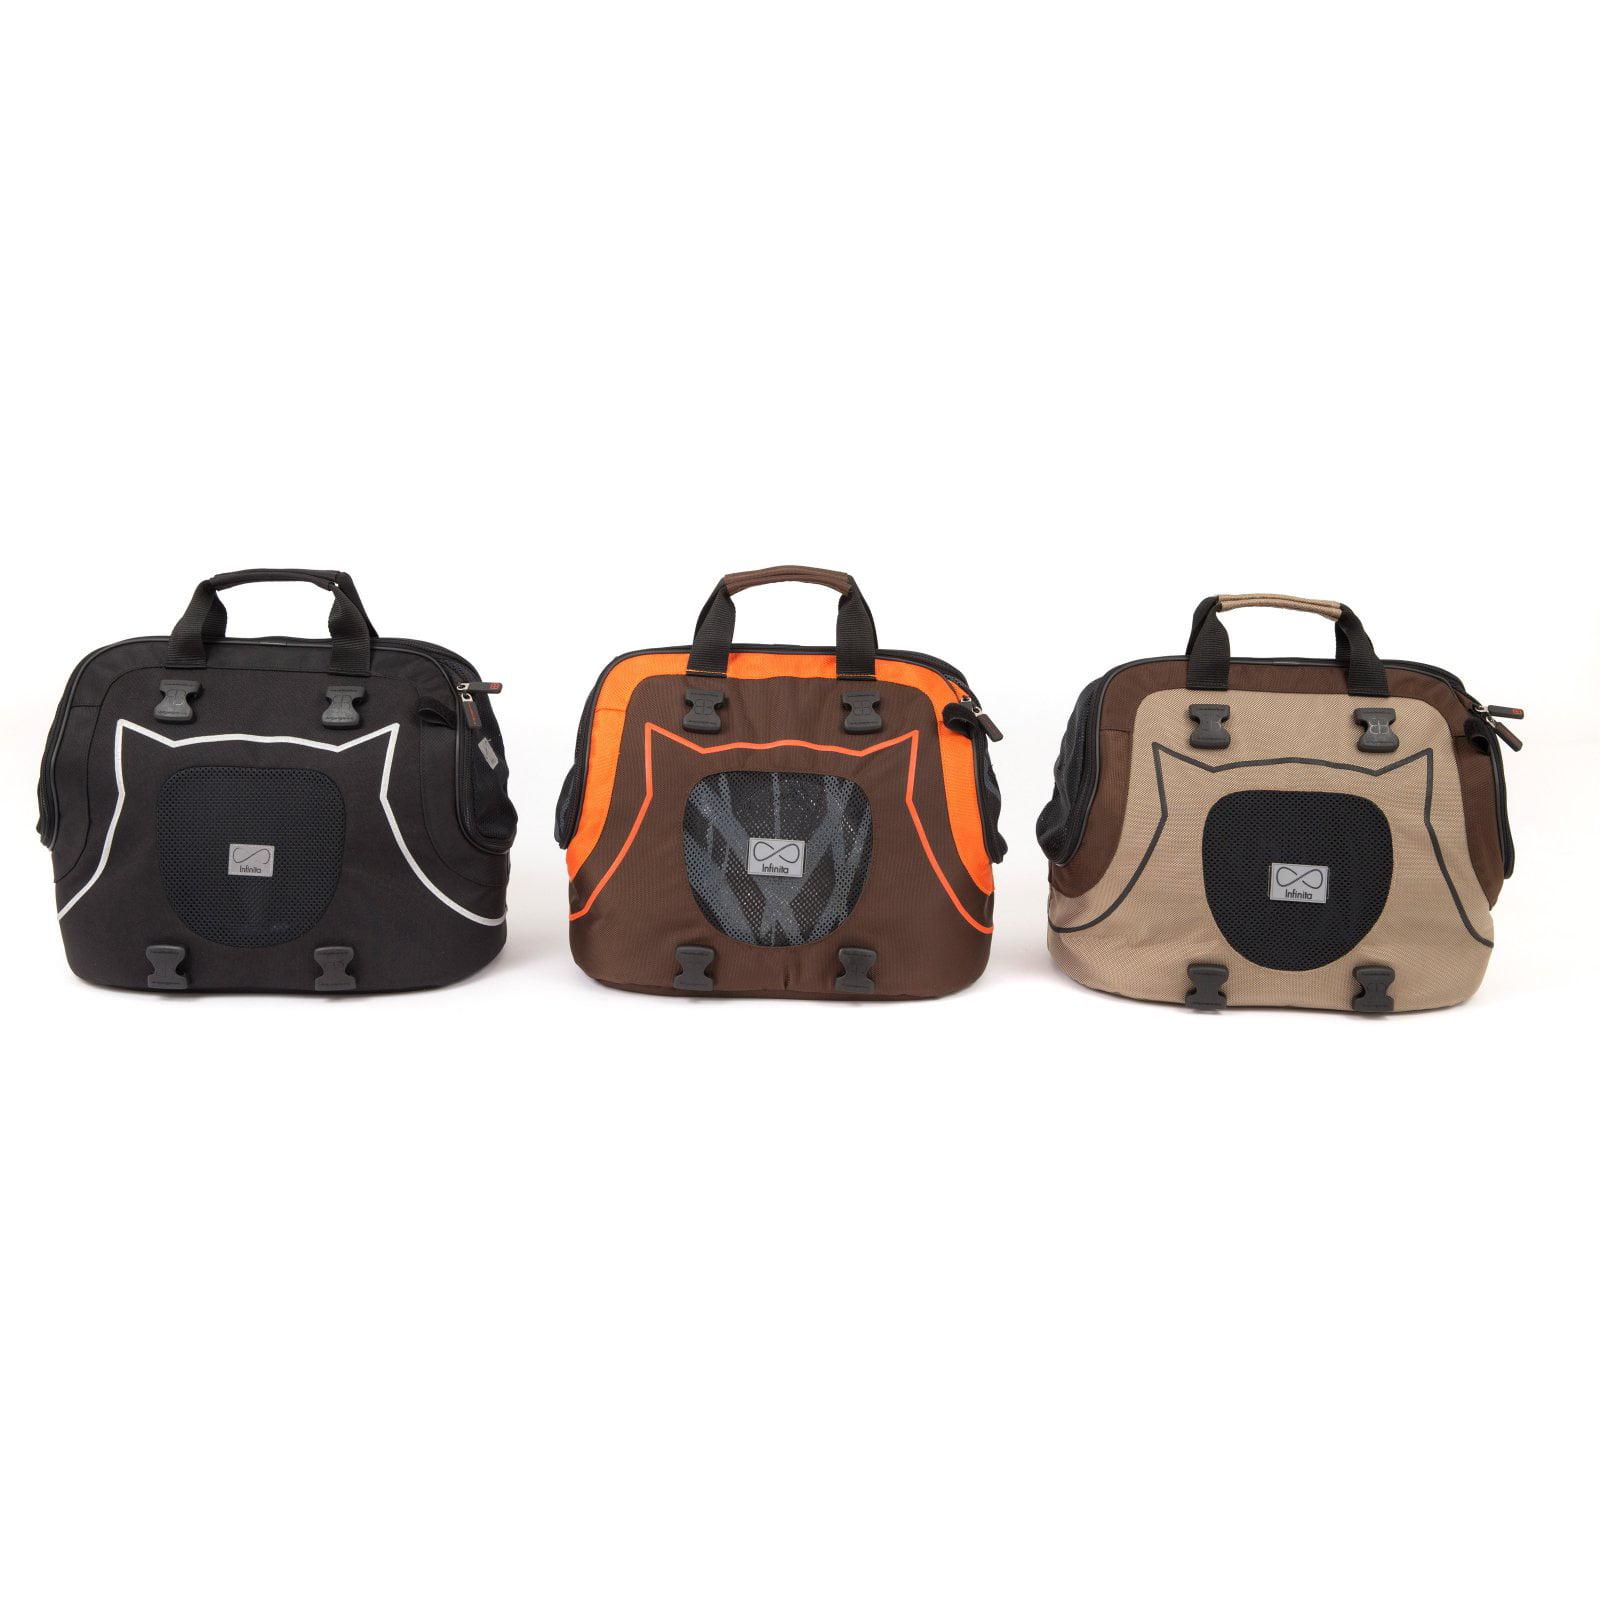 PETEGO Infinita Universal Sport Bag Pet Carrier